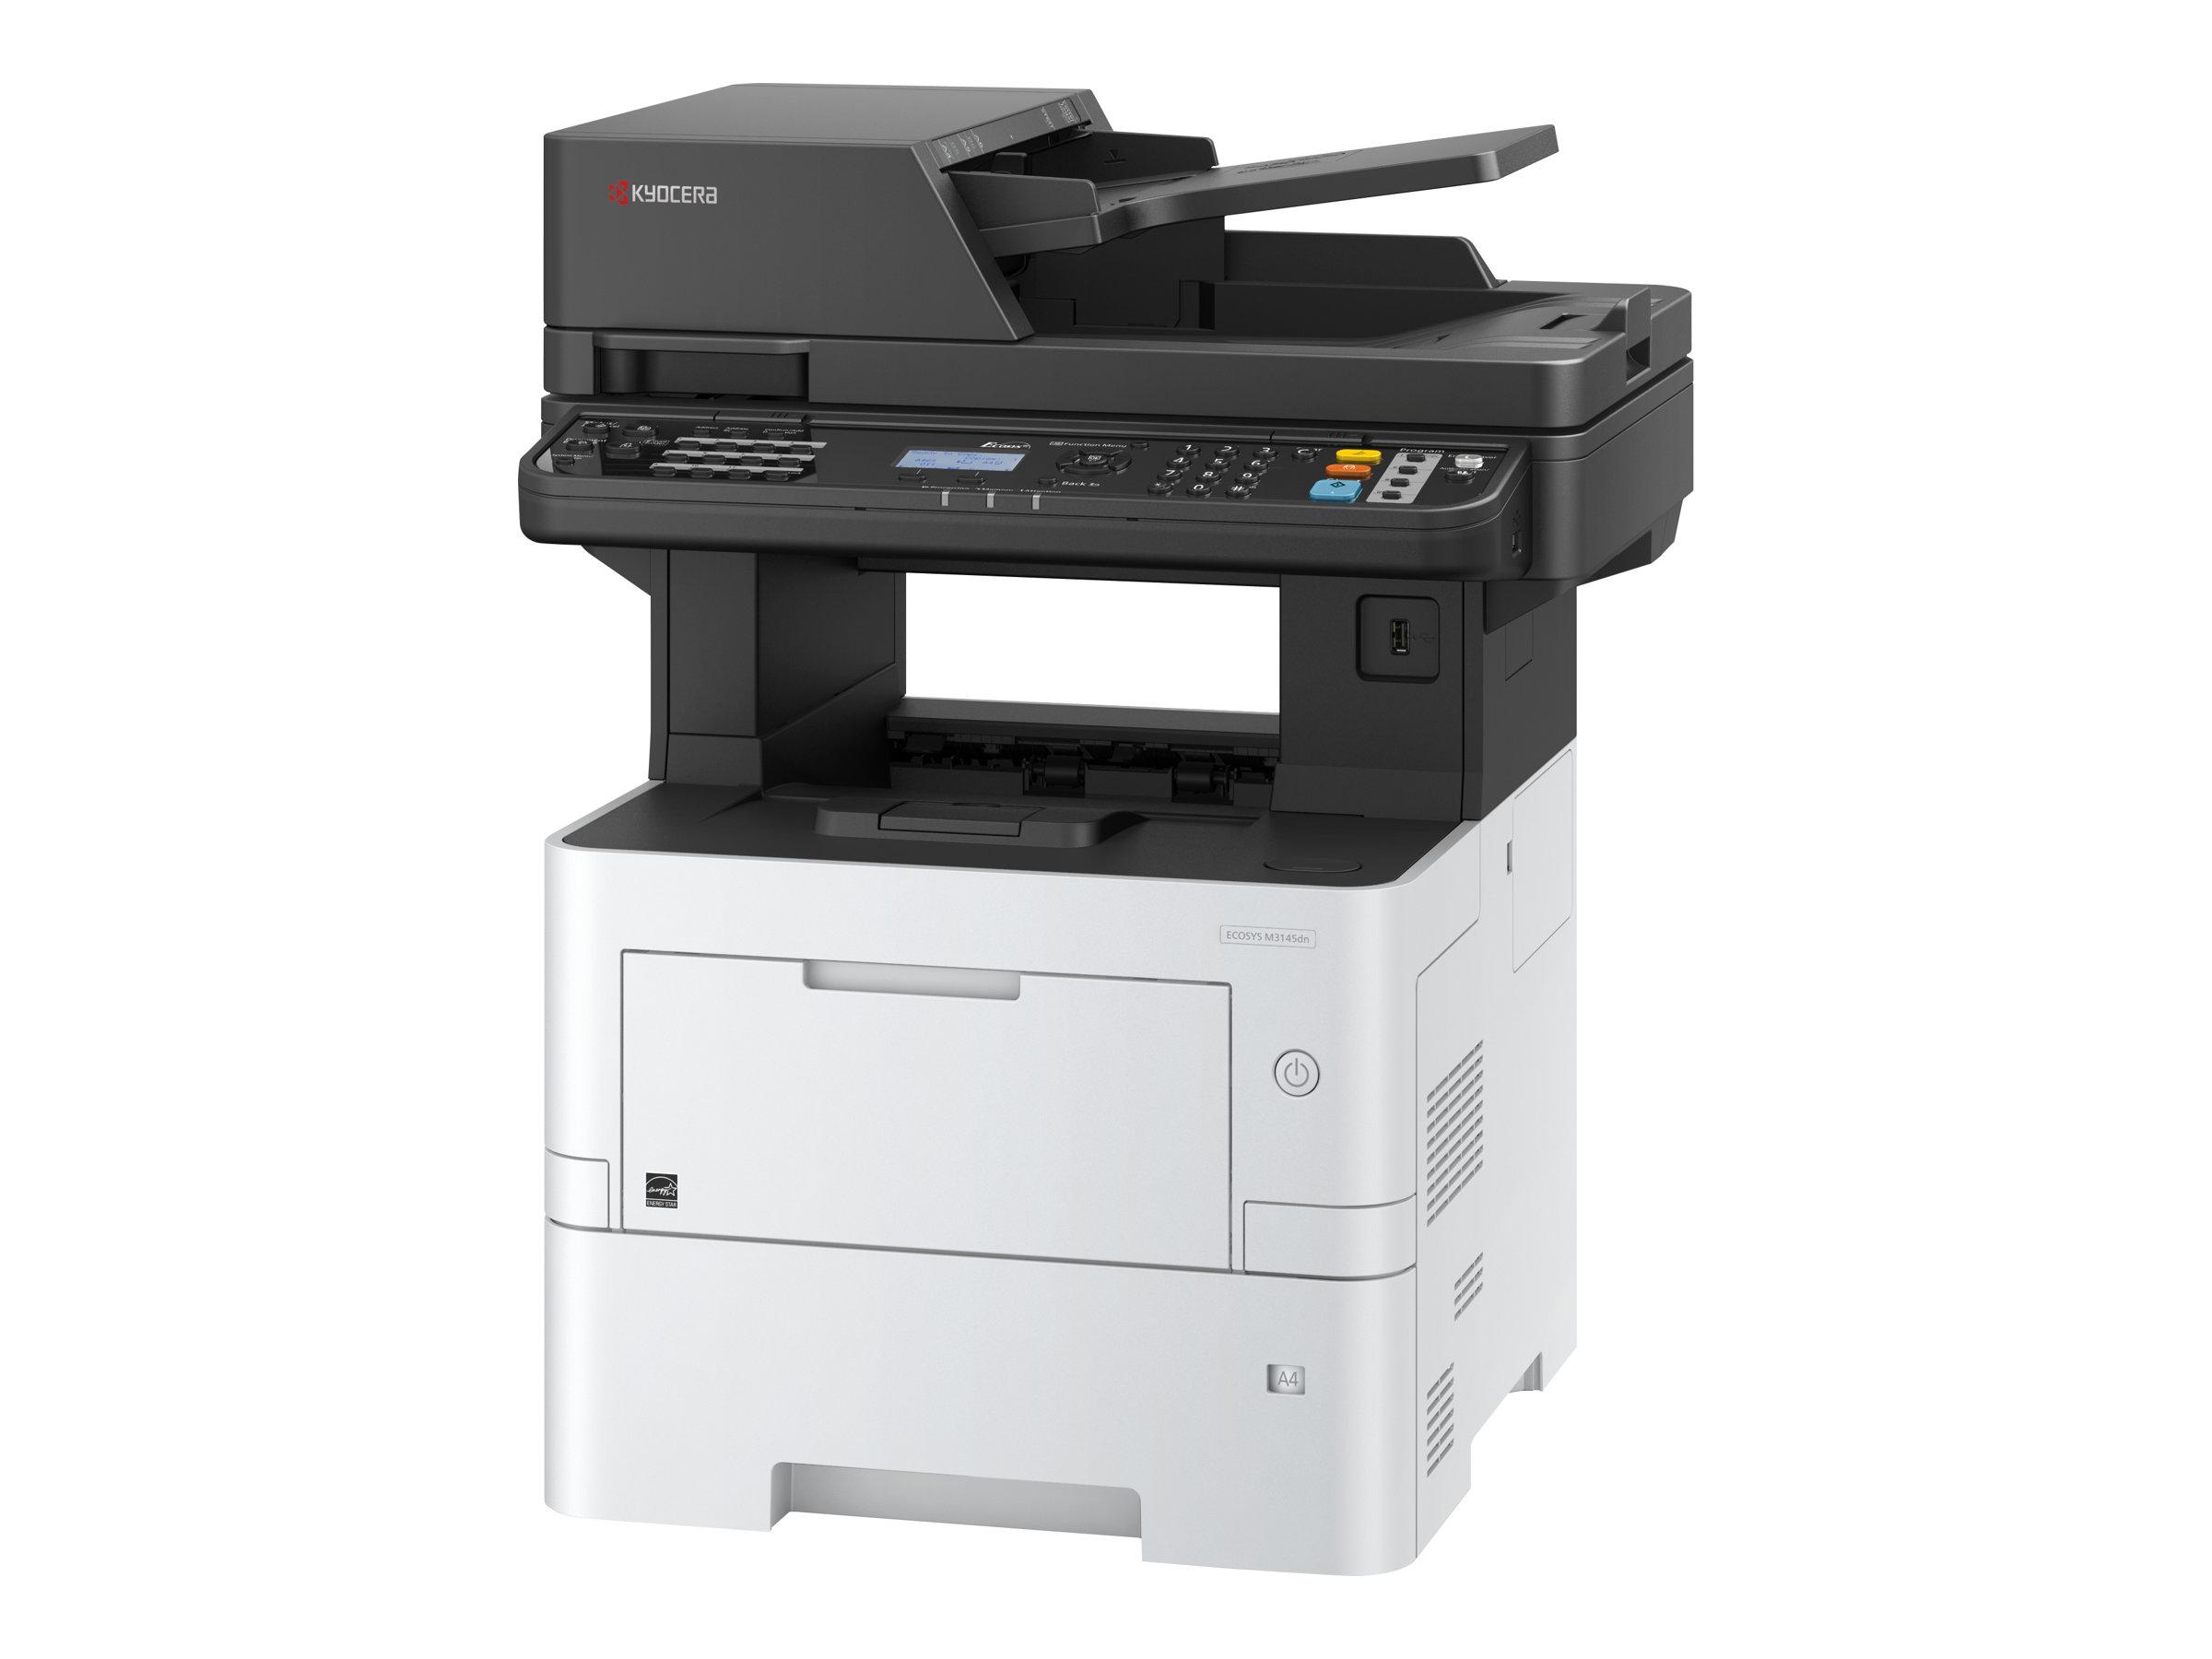 Kyocera ECOSYS M3145DN - Multifunktionsdrucker - s/w - Laser - A4 (210 x 297 mm)